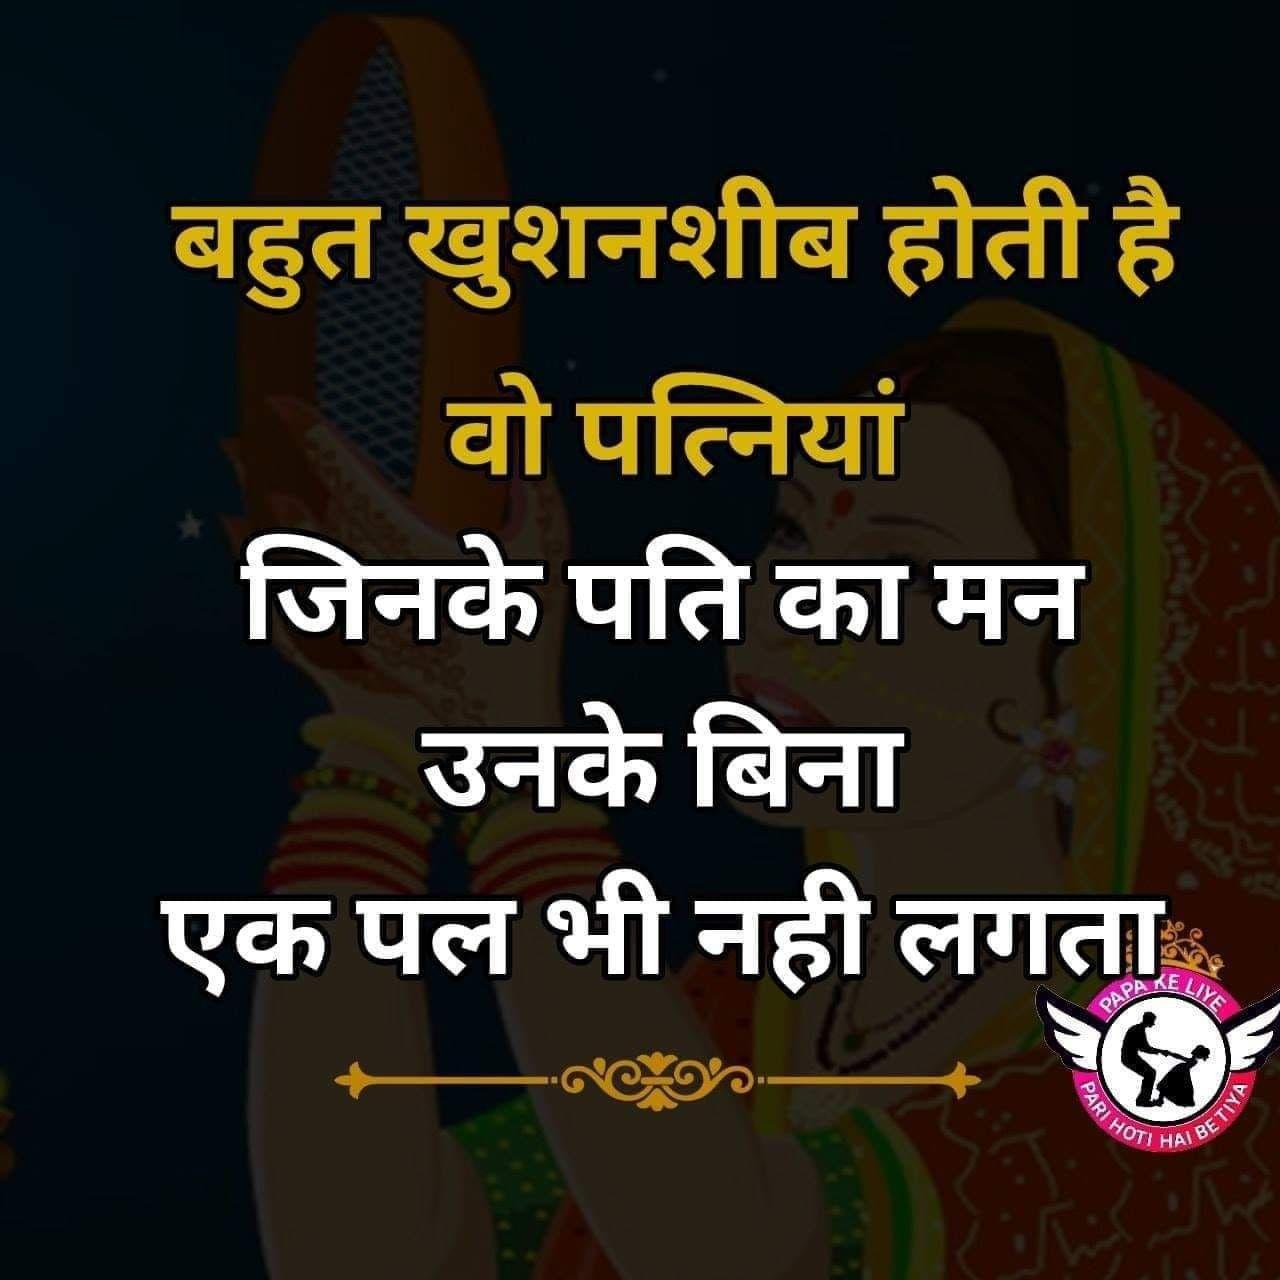 Pin By Kirti Bhatnagar On Quite Pinterest Hindi Quotes Quotes